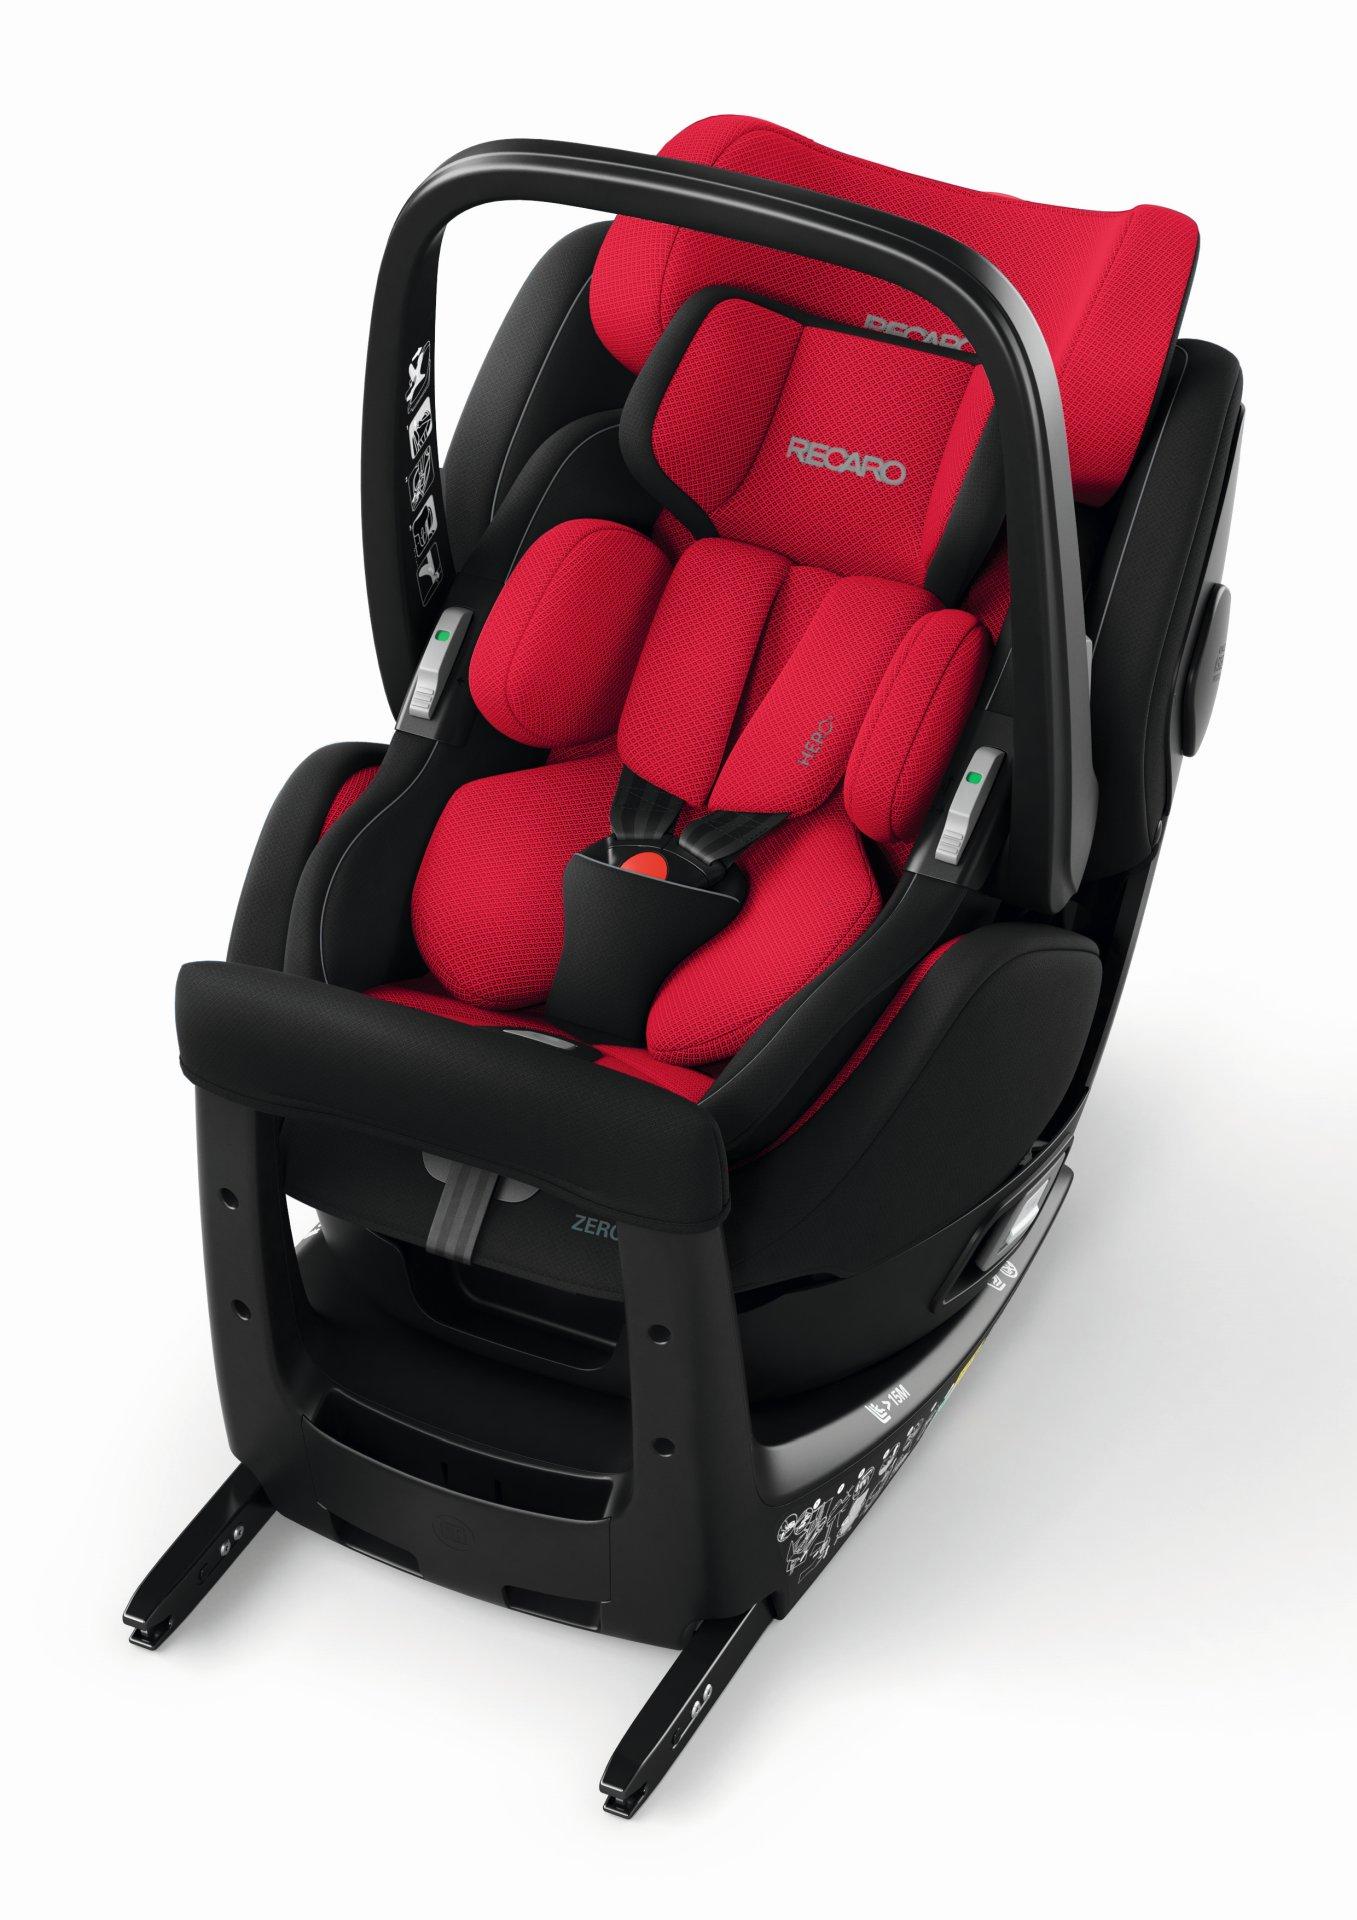 recaro zero 1 elite i size 2019 racing red buy at kidsroom car seats. Black Bedroom Furniture Sets. Home Design Ideas